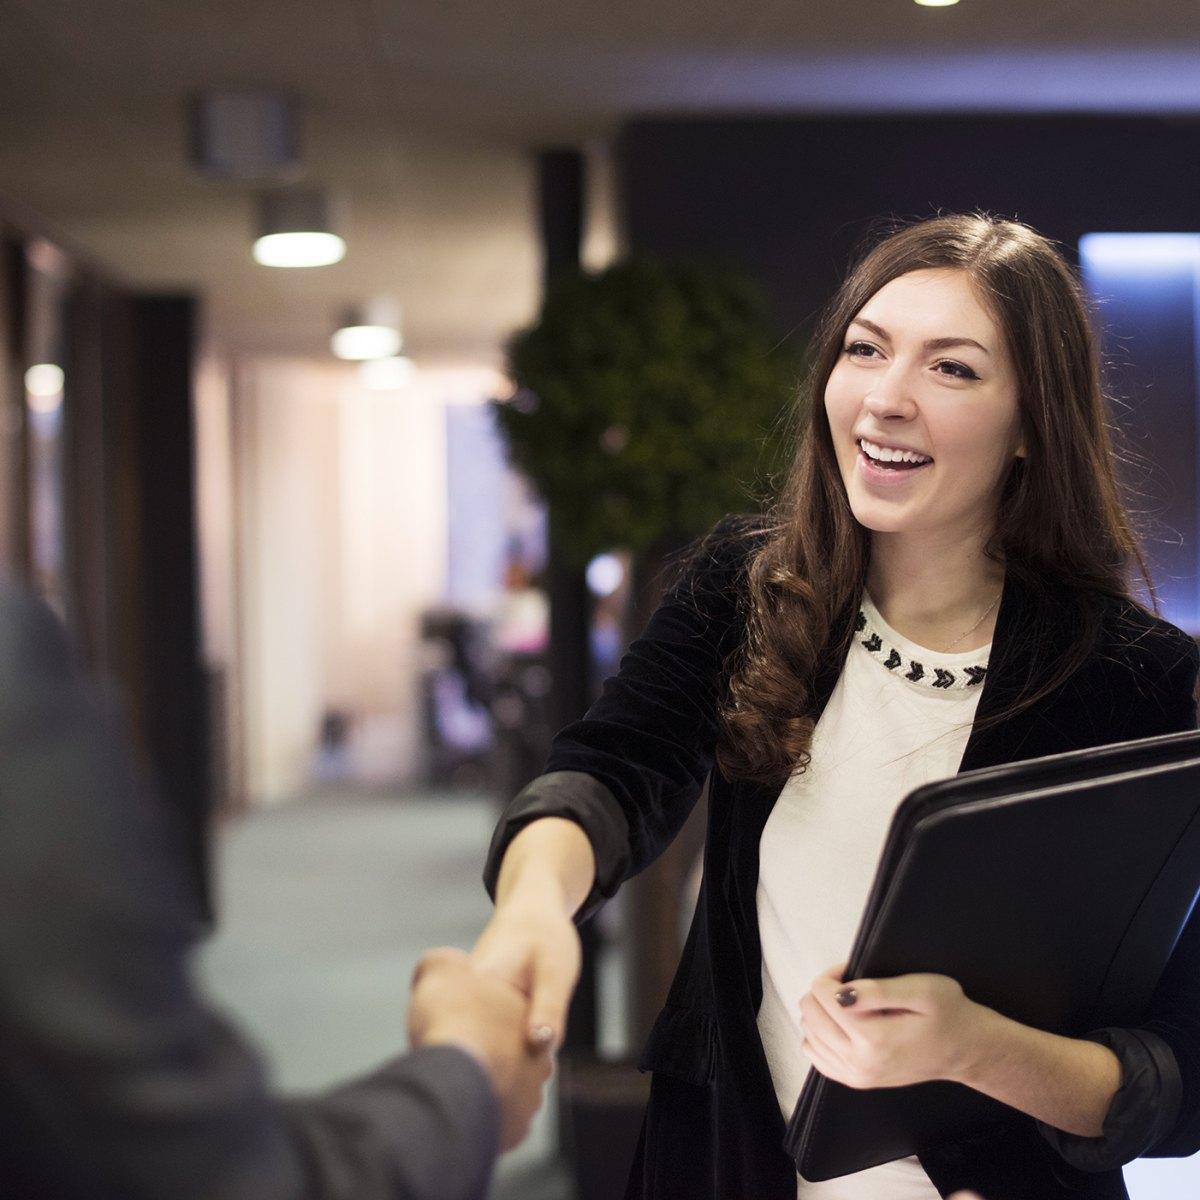 Training Auditing the Marketing Function